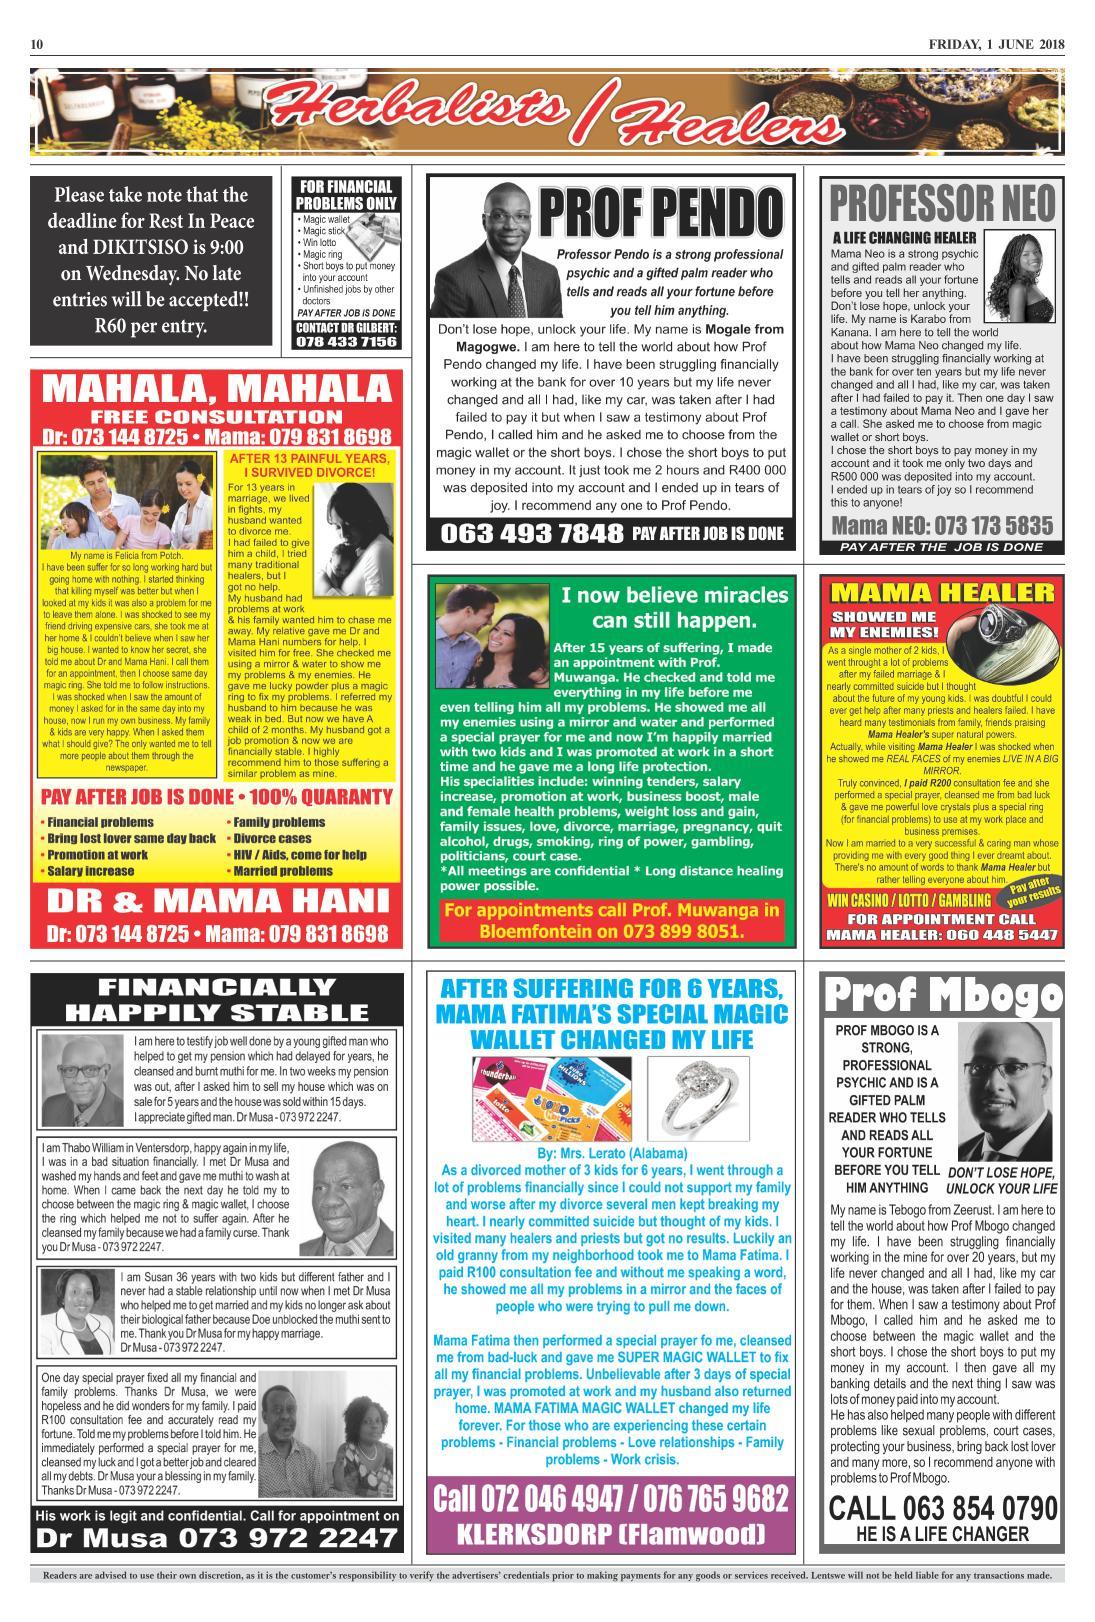 www salocalnewspapers co za - /newspapers/lentswe/previousnewspapers